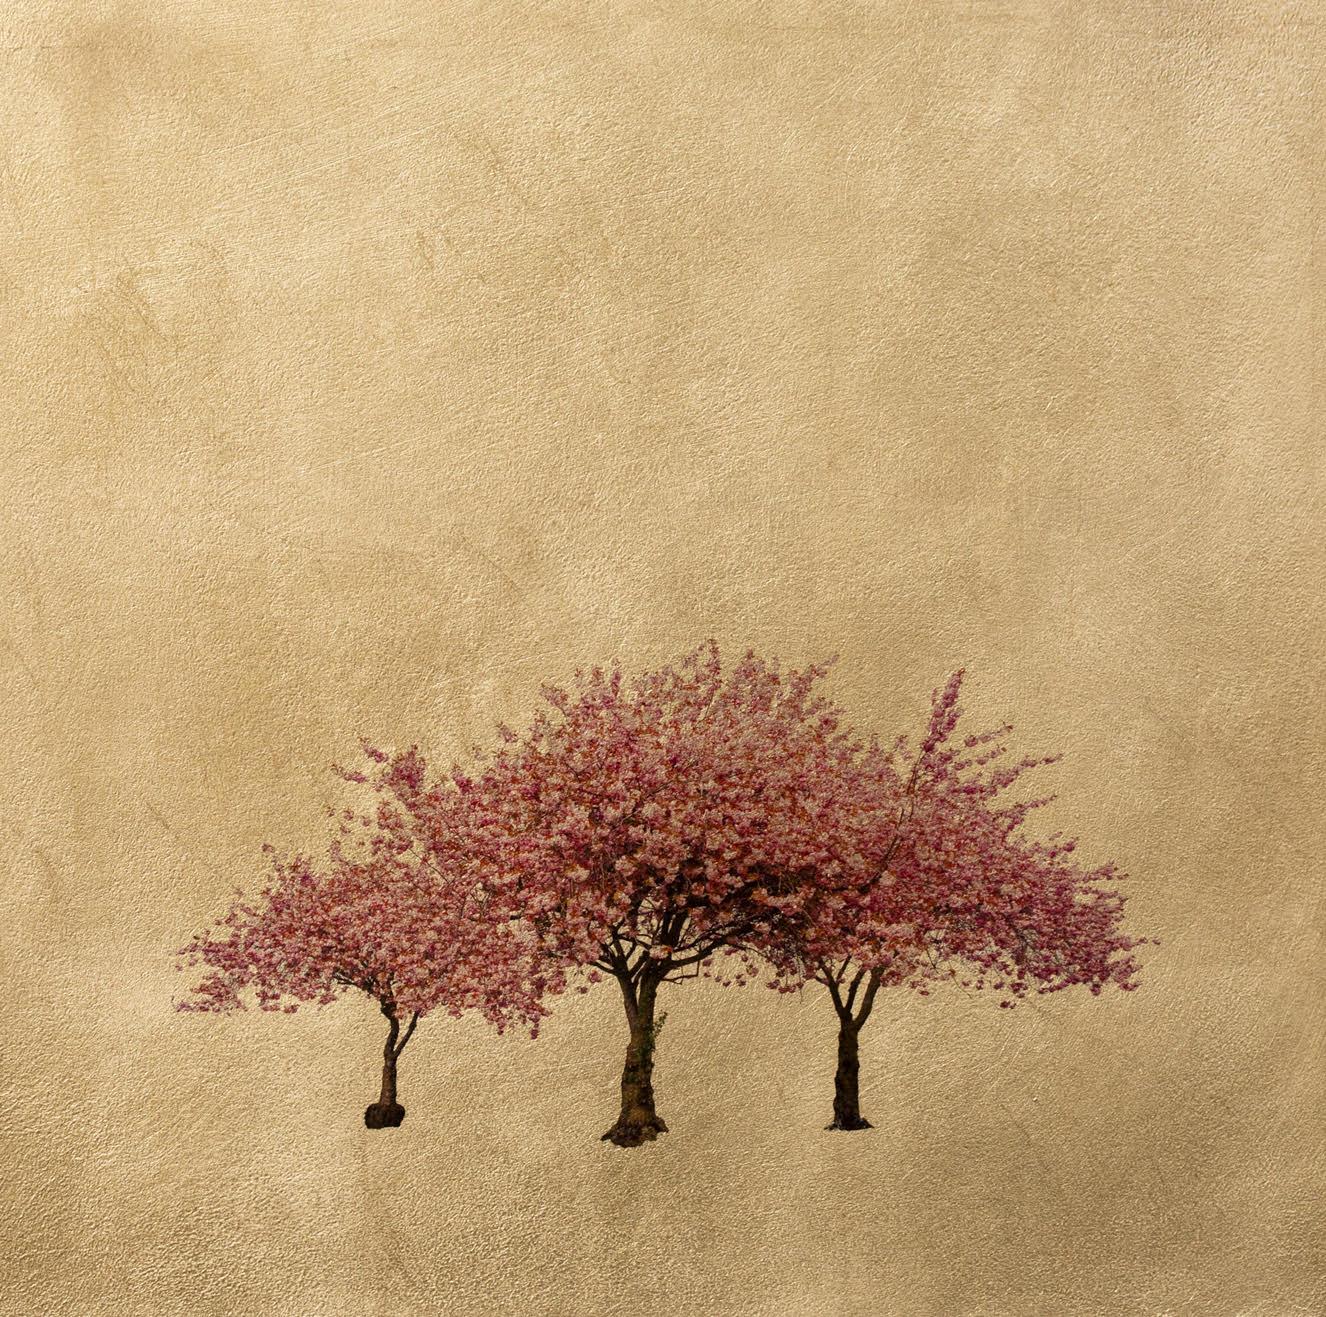 Prunus Serrulata by Robert Pereira Hind